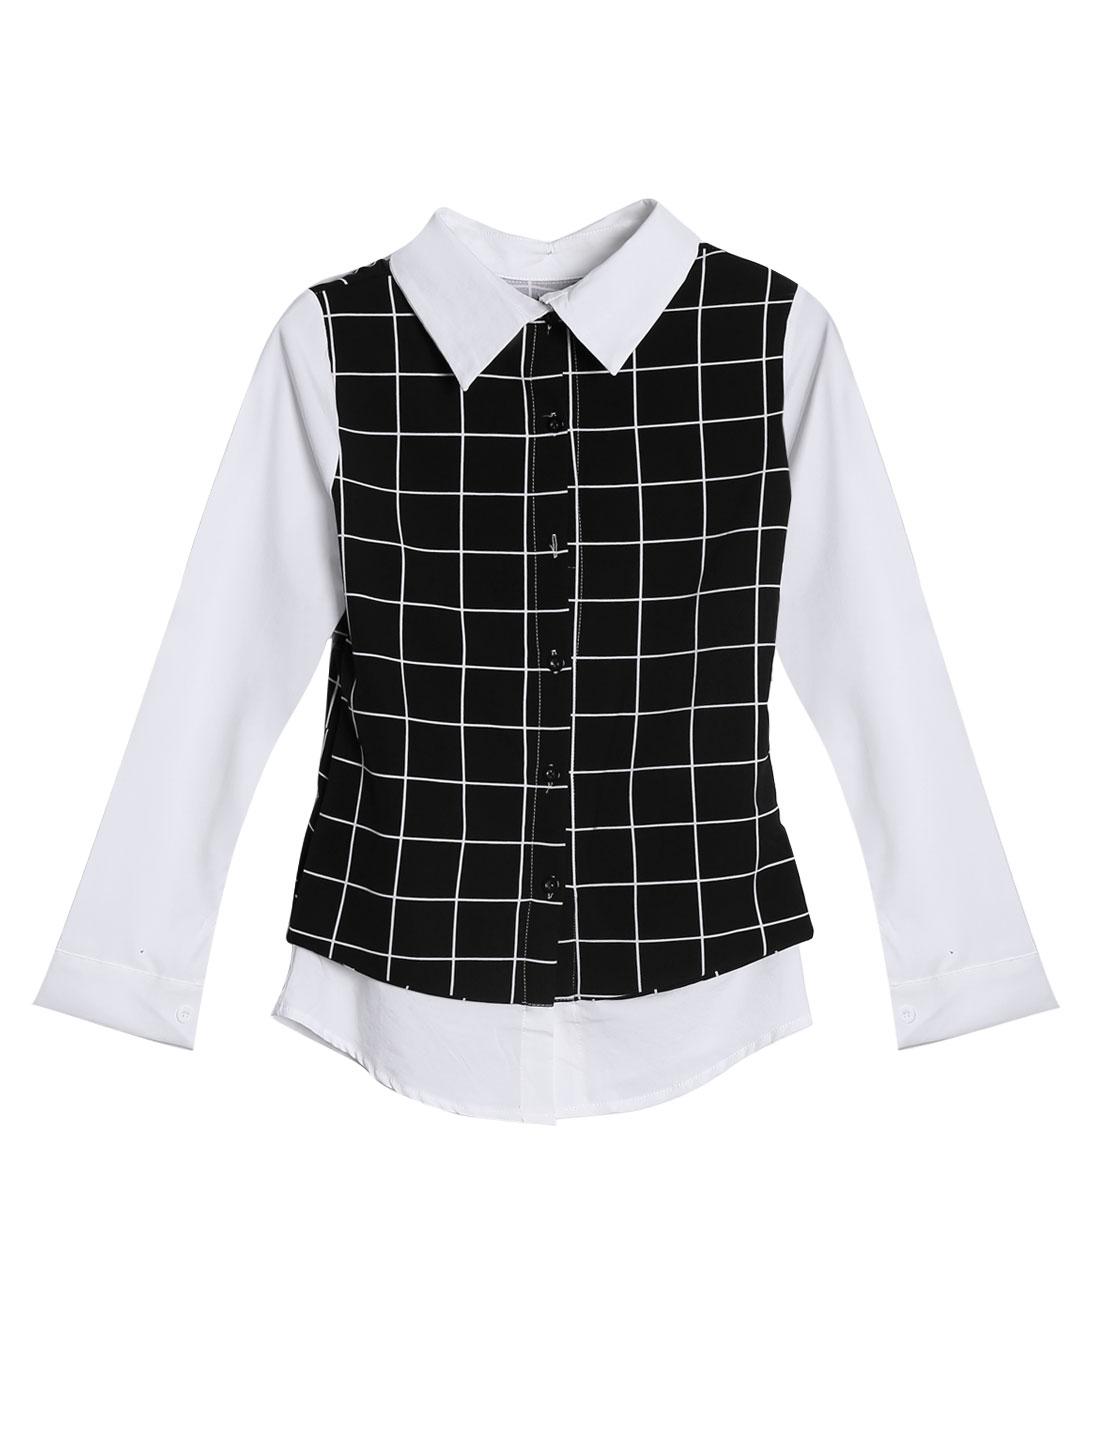 Lady Plaids Pattern Single Breasted Back Casual Shirt Black White XS